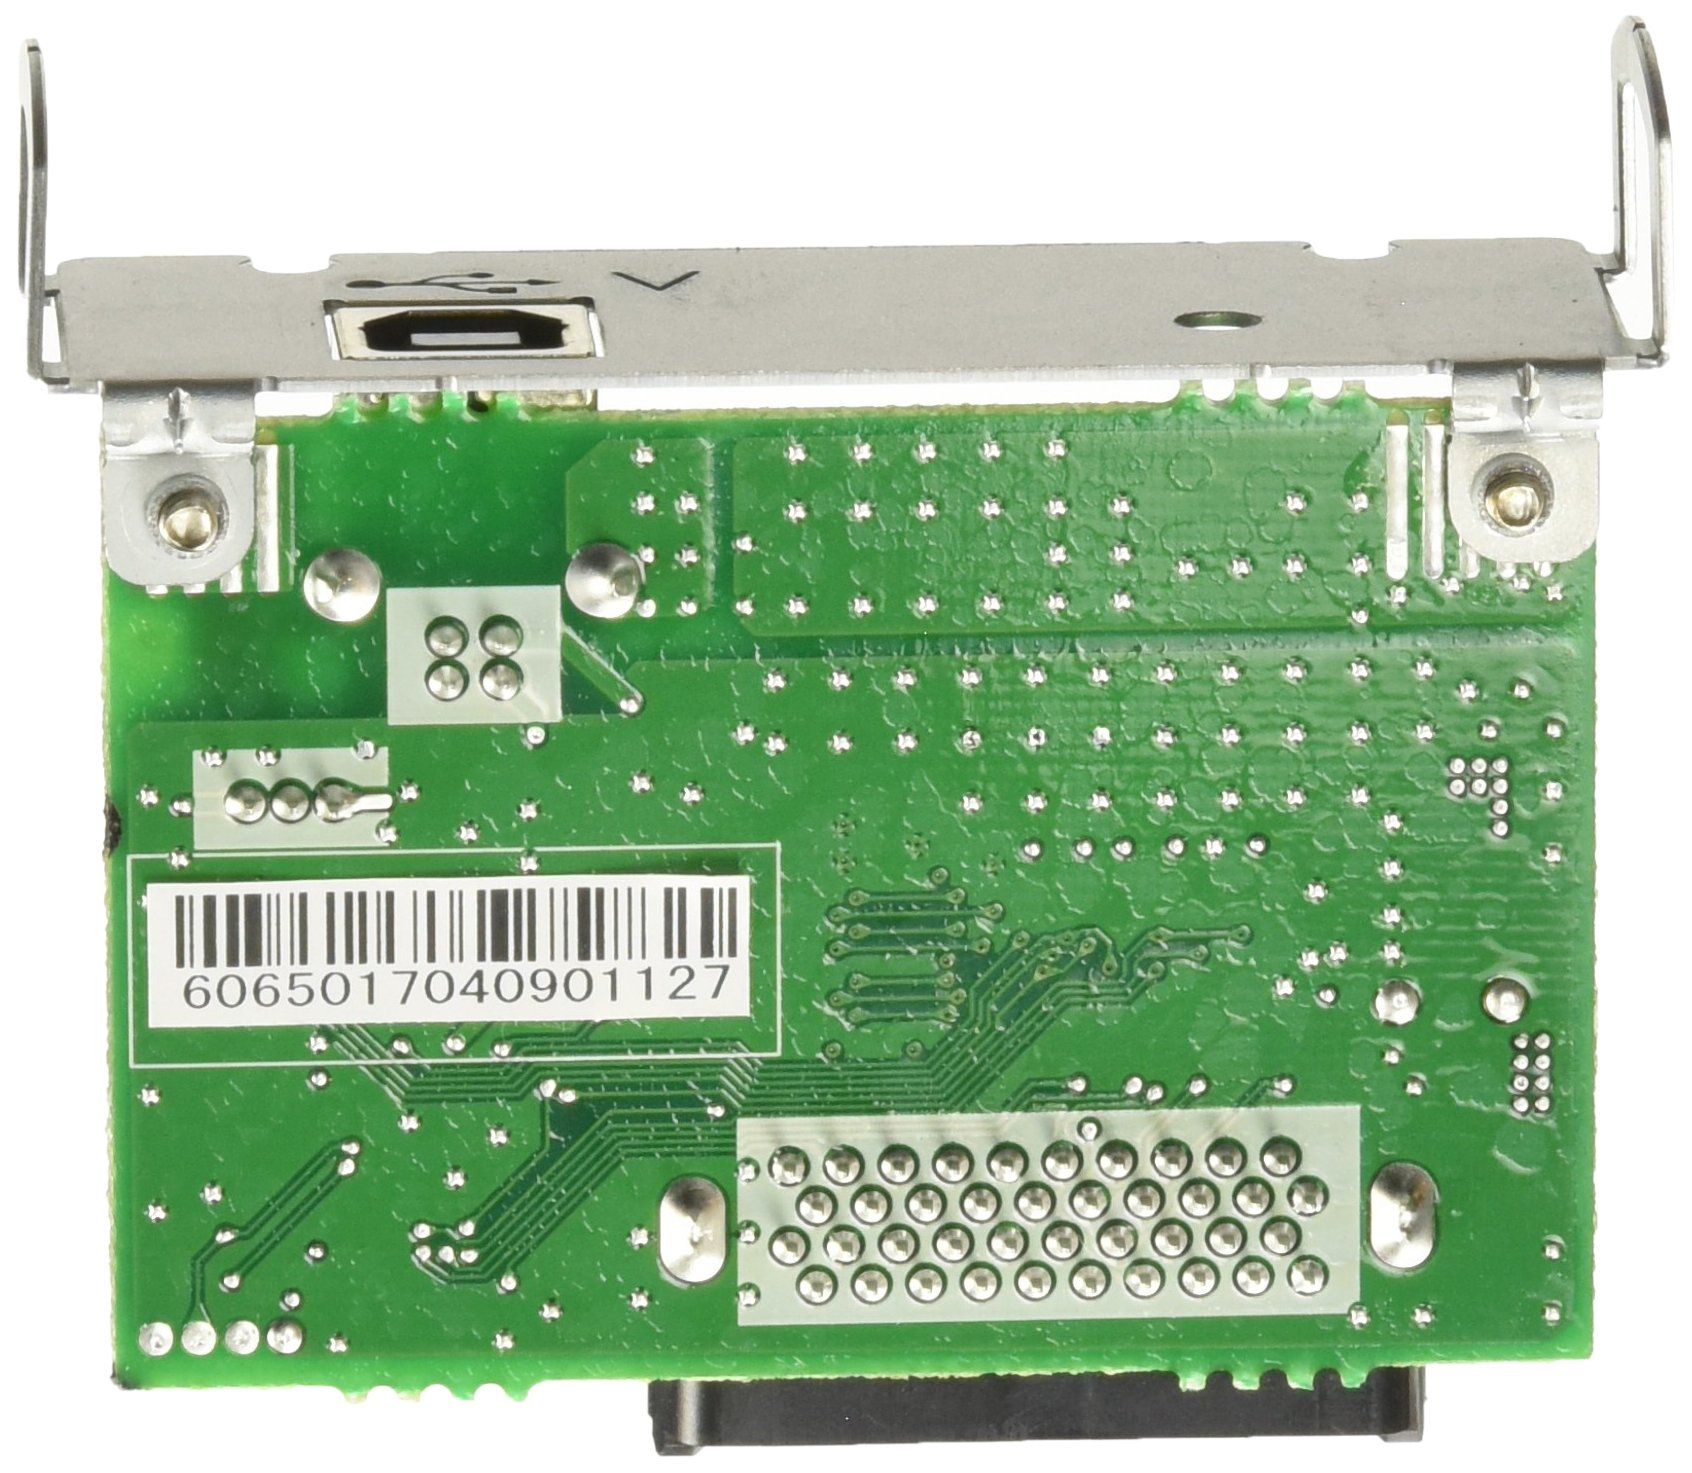 Star Micronics 39607820 USB Interface Board by Star Micronics (Image #2)